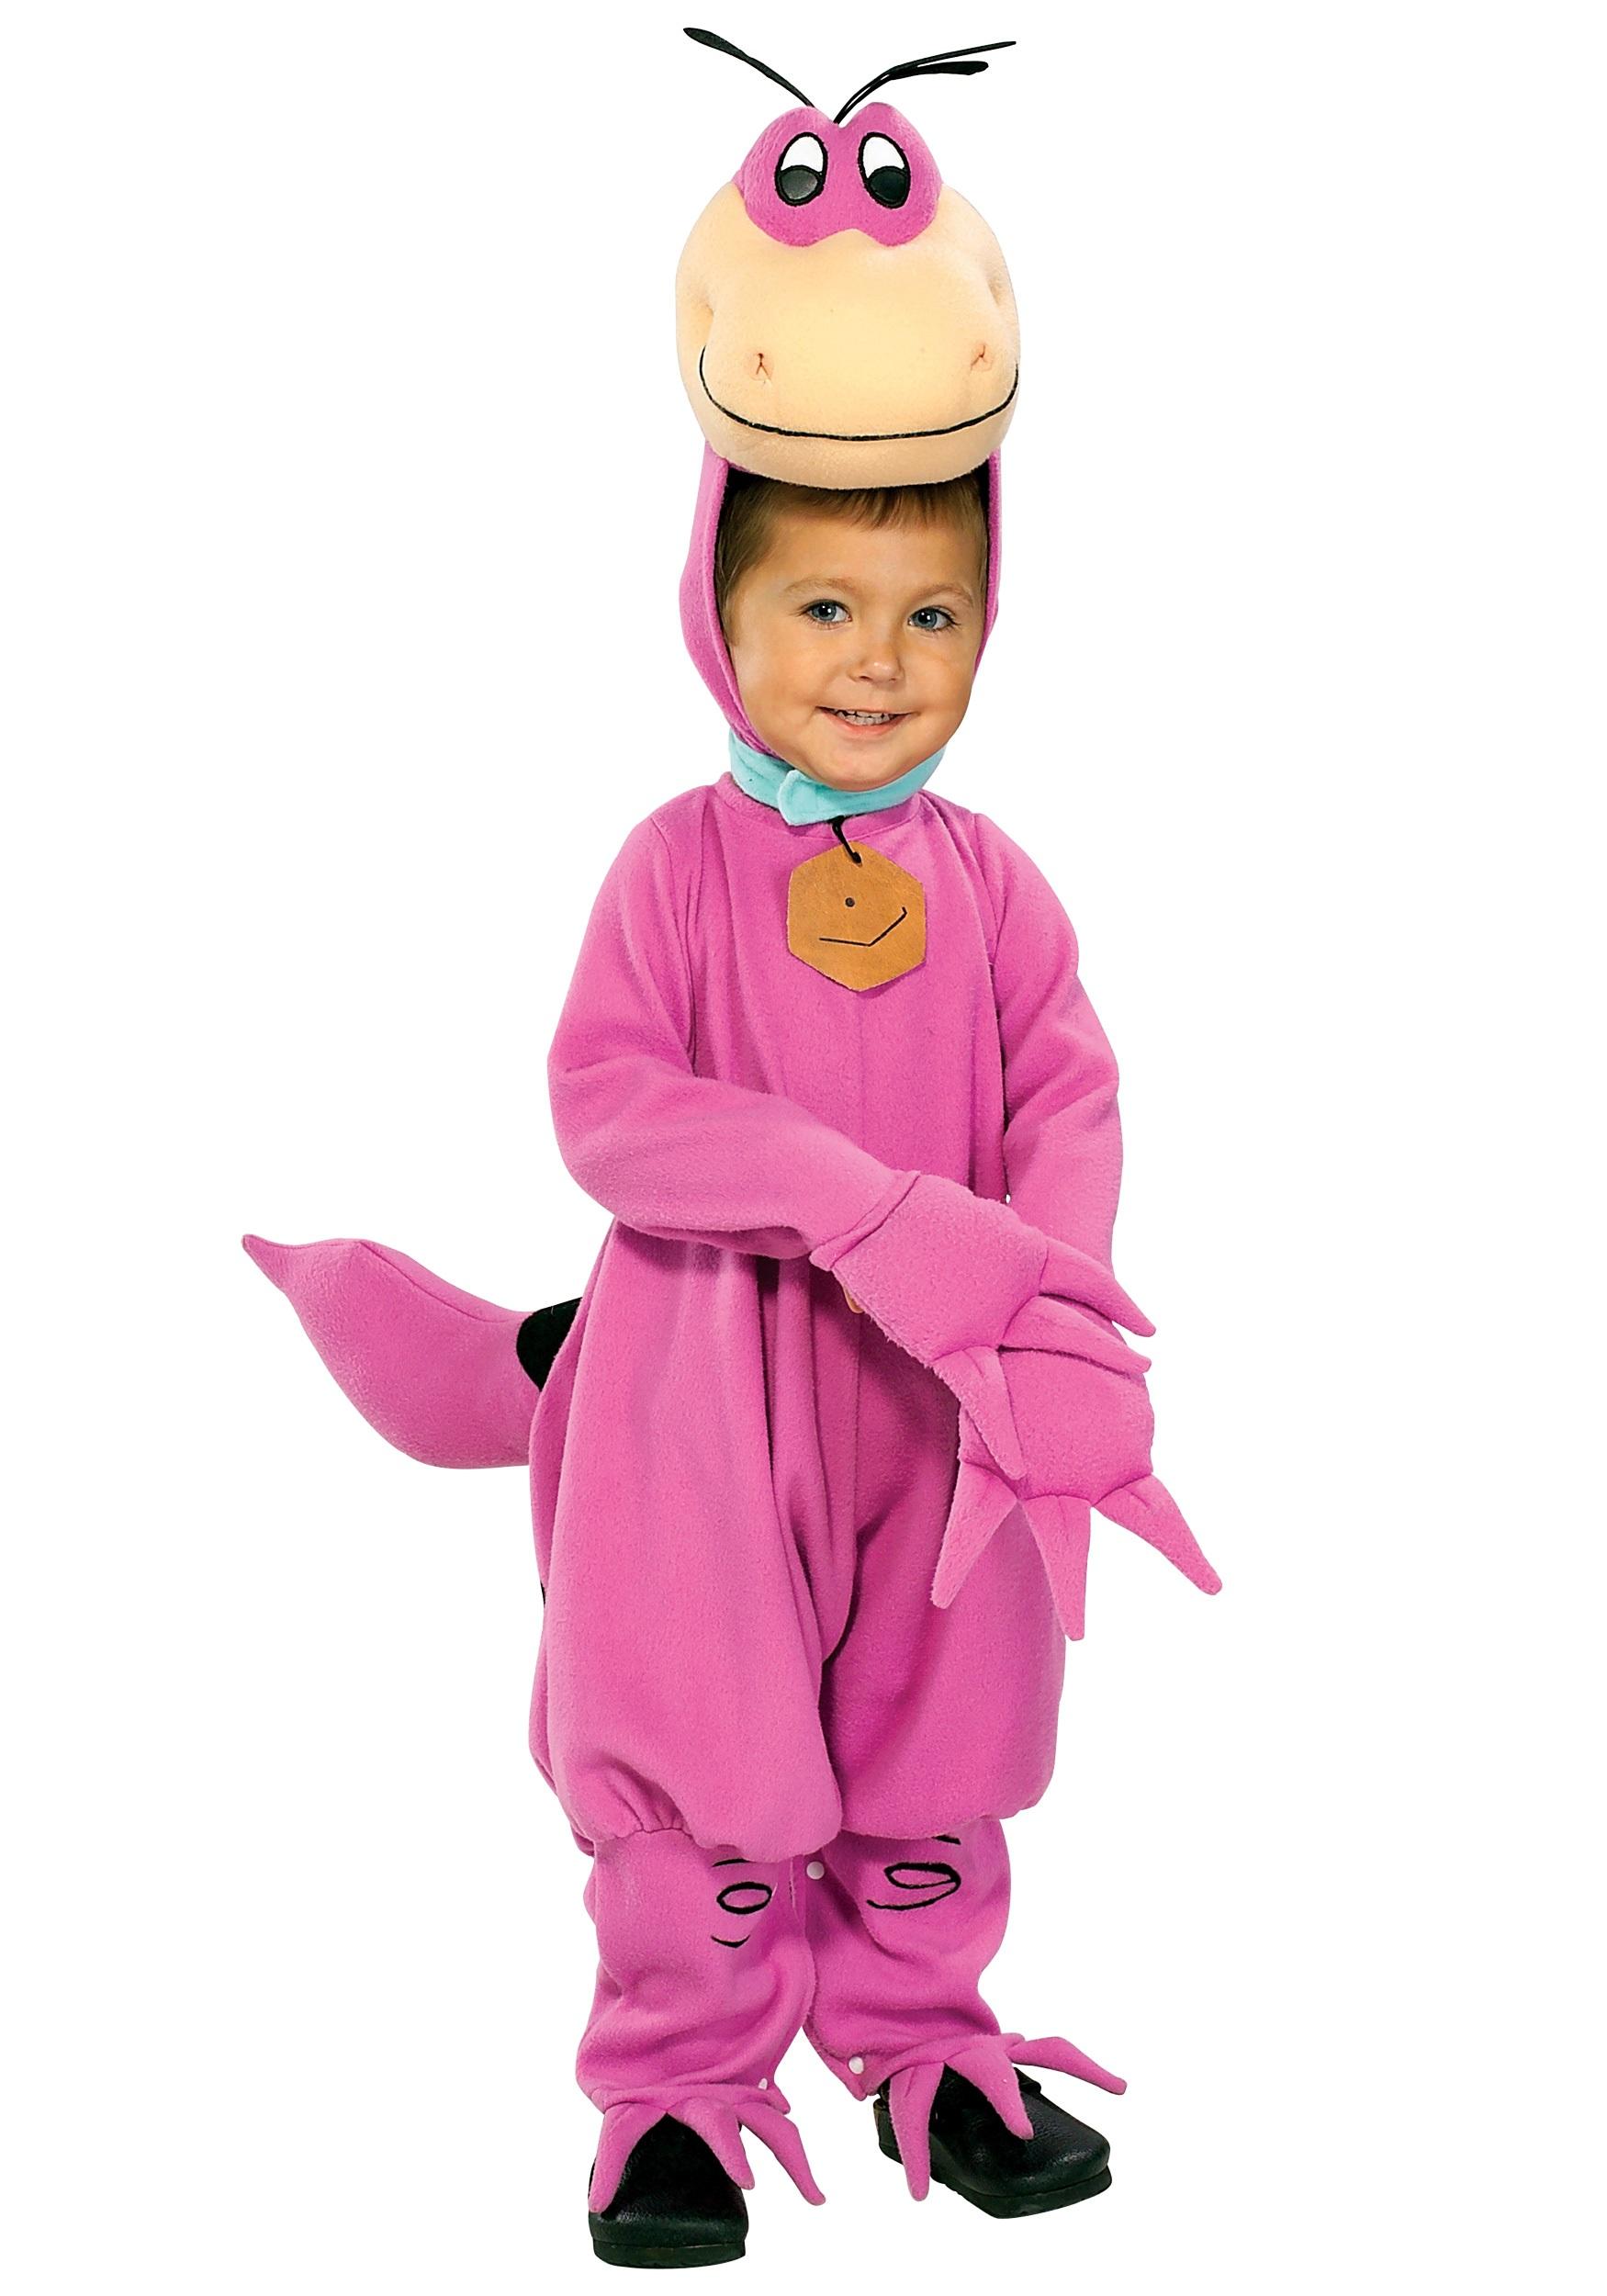 Kids Dino Costume  sc 1 st  Halloween Costumes & Flintstones Costumes u0026 Accessories - HalloweenCostumes.com